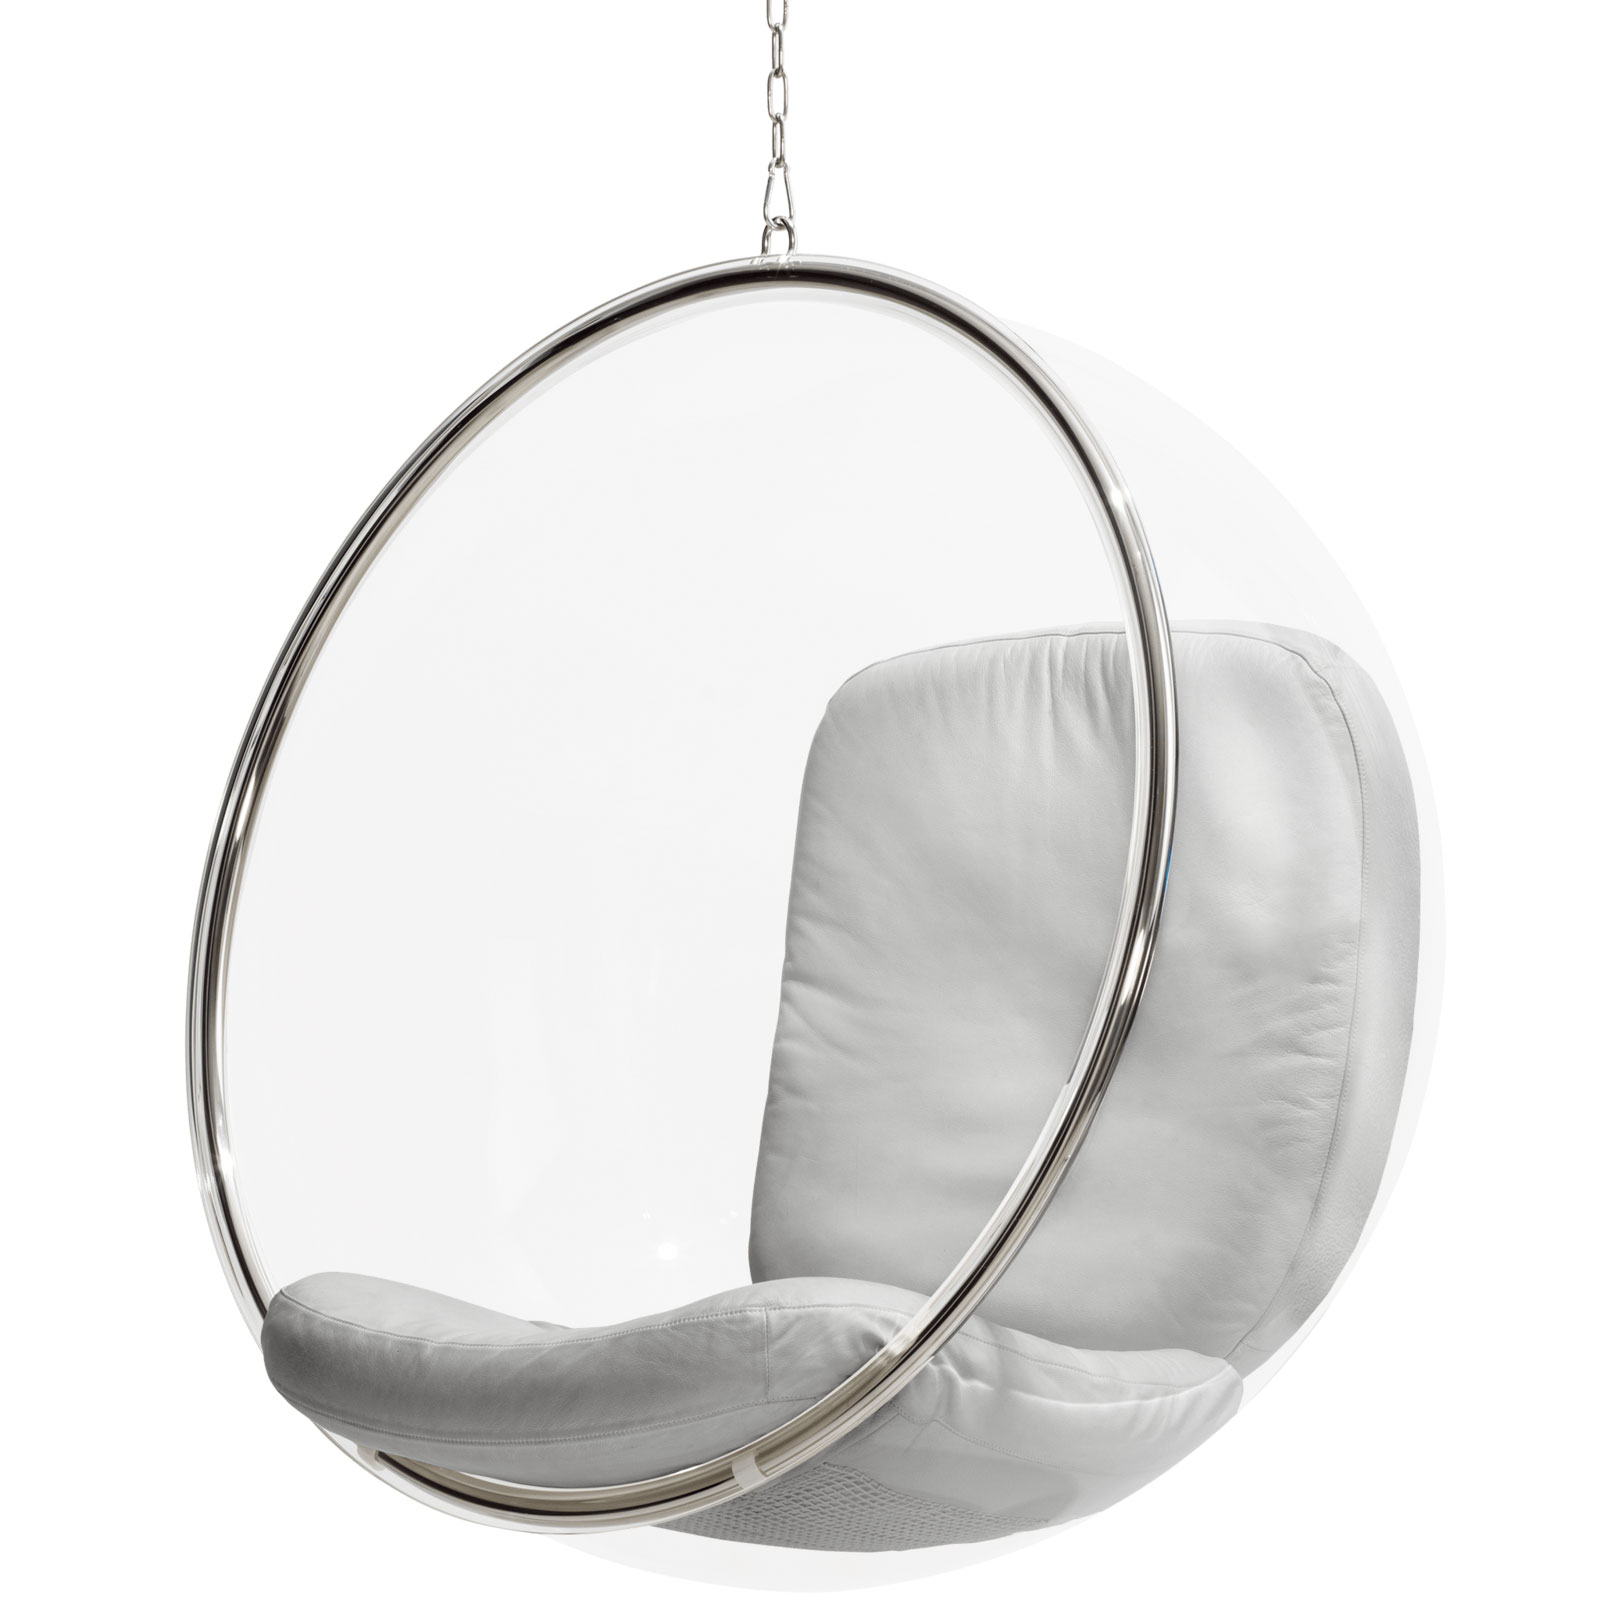 Designwebstore Bubble Chair Von Eero Aarnio Leder Silber